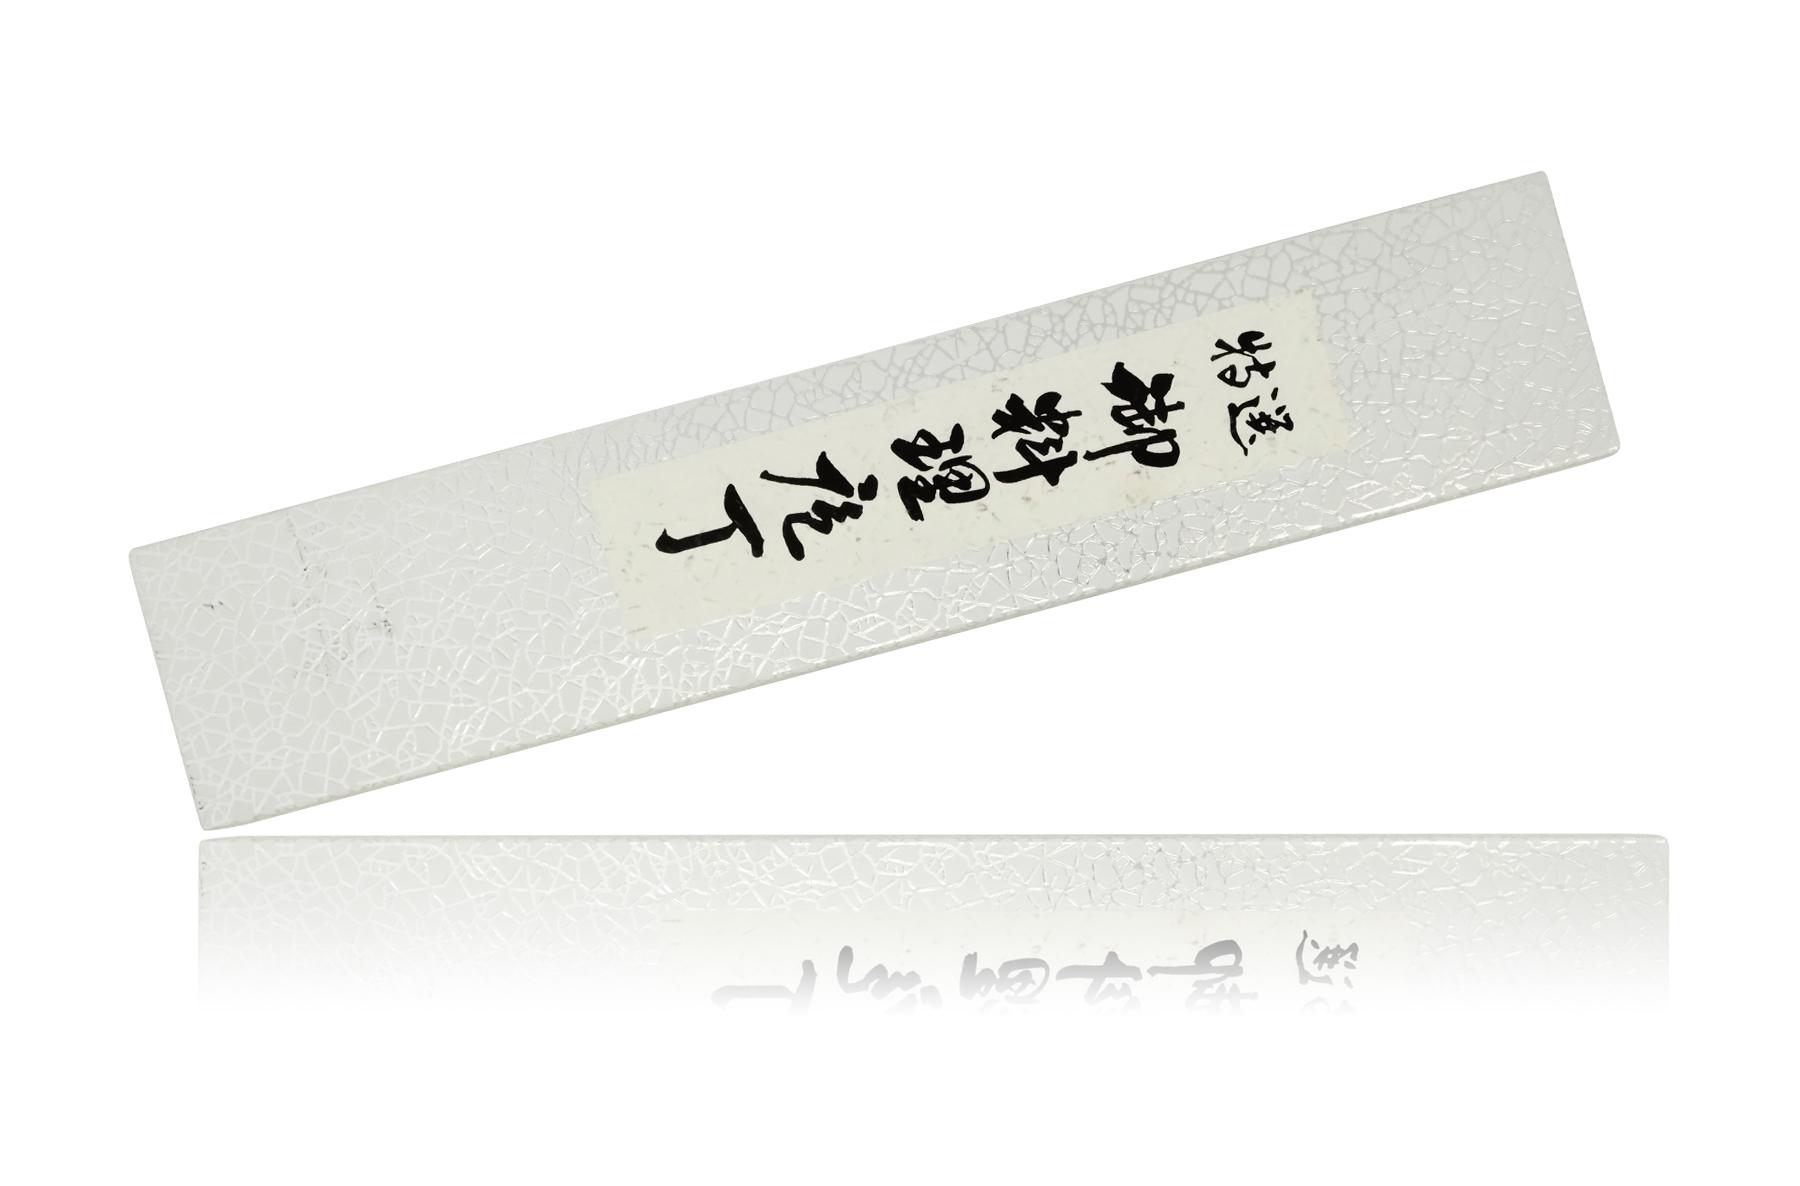 Нож кухонный стальной Шеф 180мм Hiroo Itou Damaskus HI-1166